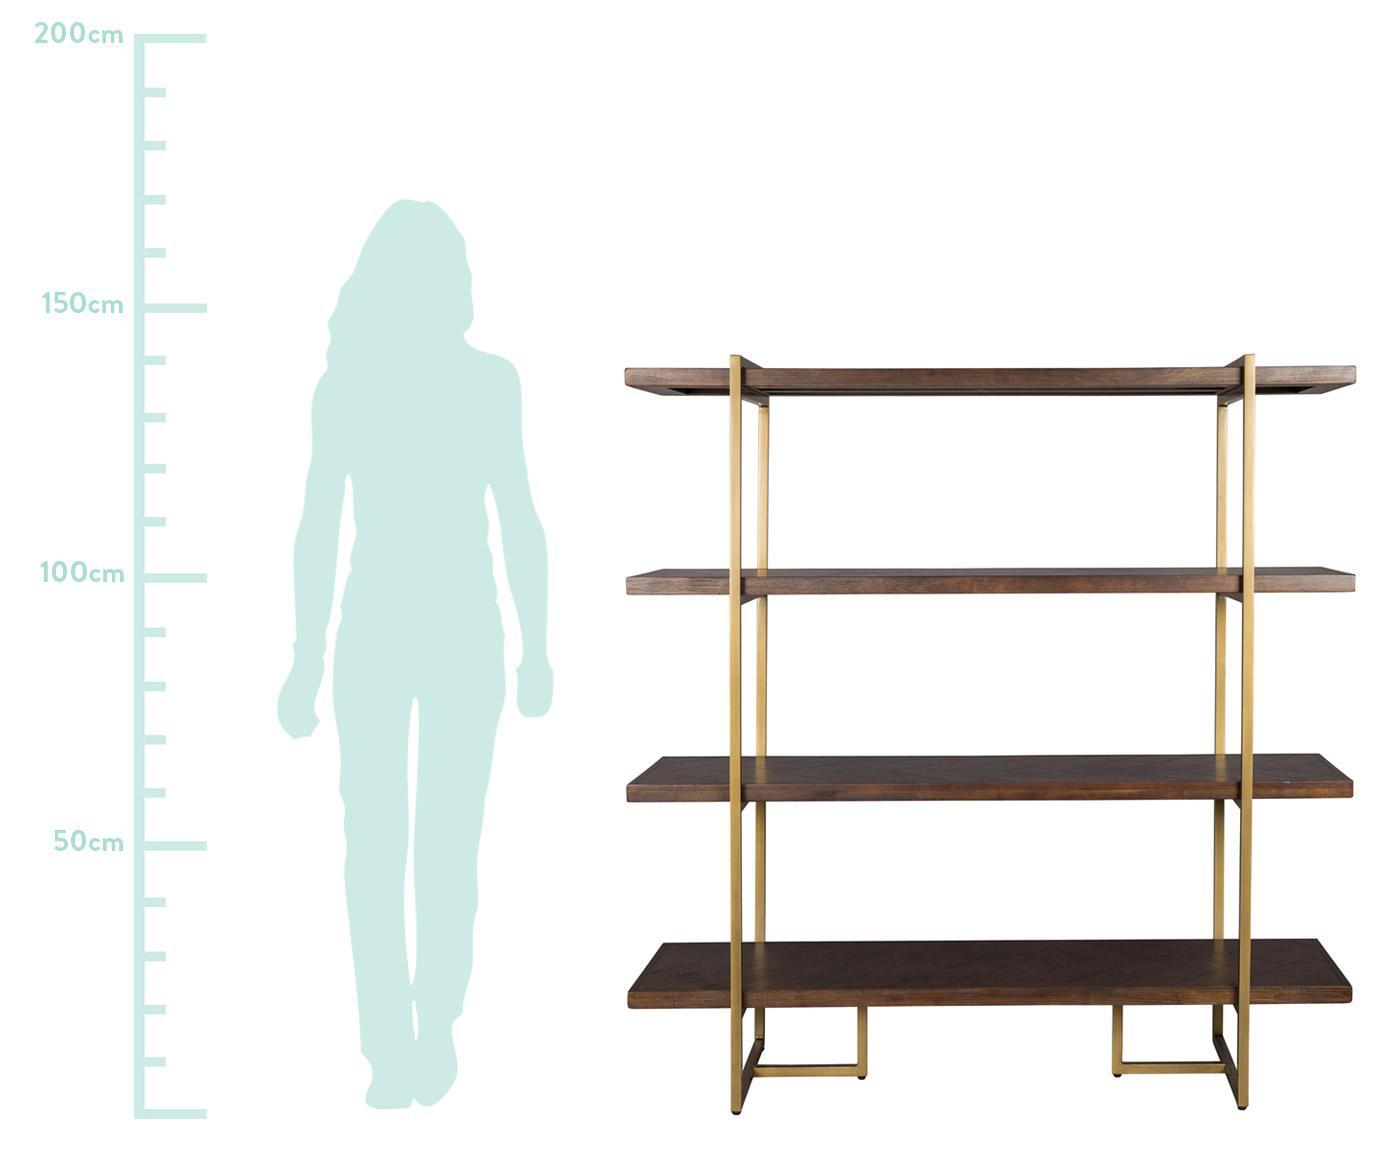 Fischgrät-Regal Class mit Akazienholzfurnier, Gestell: Metall, pulverbeschichtet, Regalbretter: Mitteldichte Holzfaserpla, Regalbretter: AkazieGestell: Altmessigfarben, 140 x 146 cm